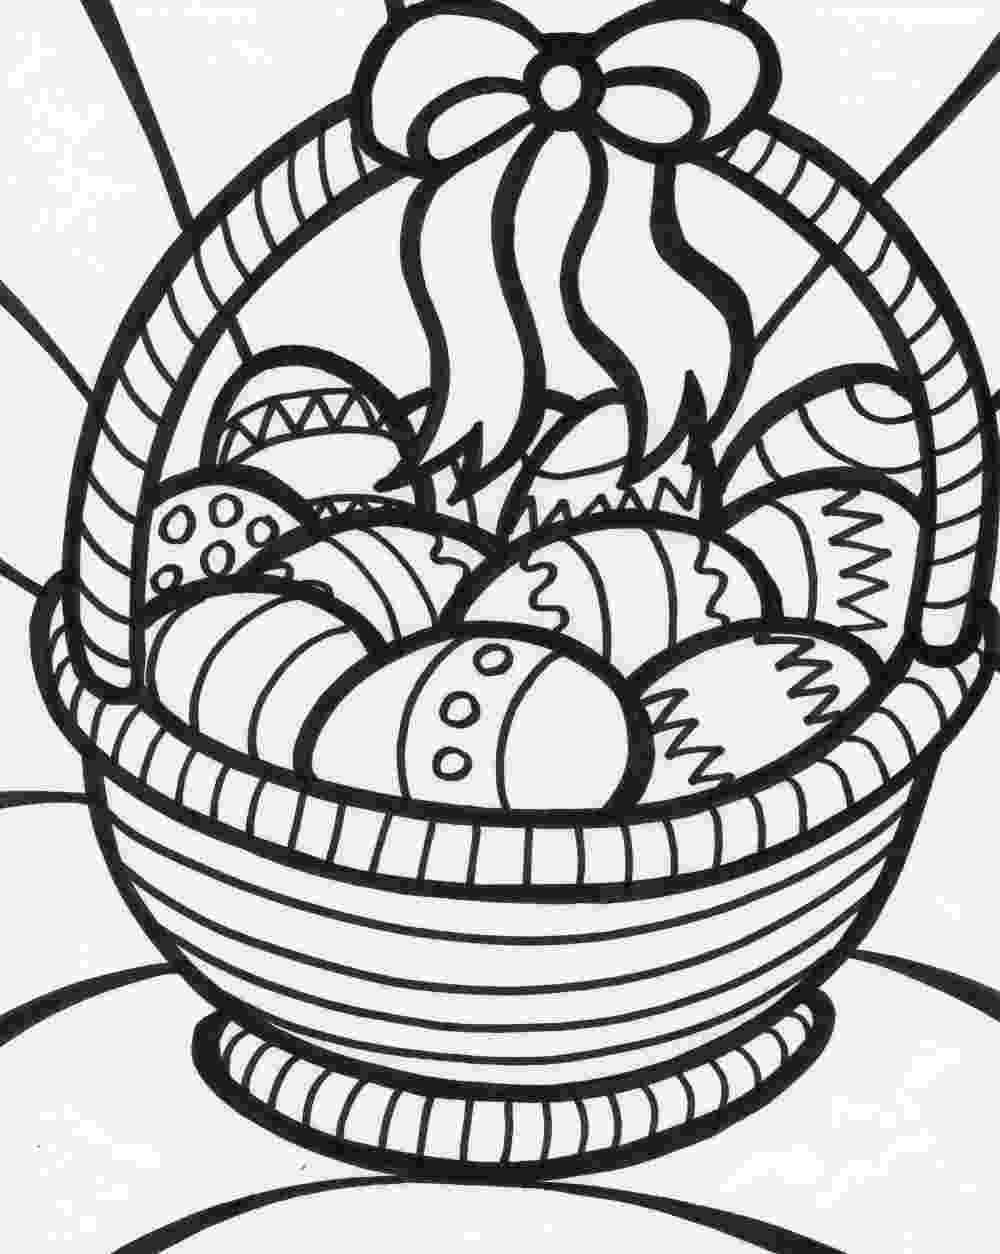 easter basket coloring sheet free coloring pages sheet easter basket coloring